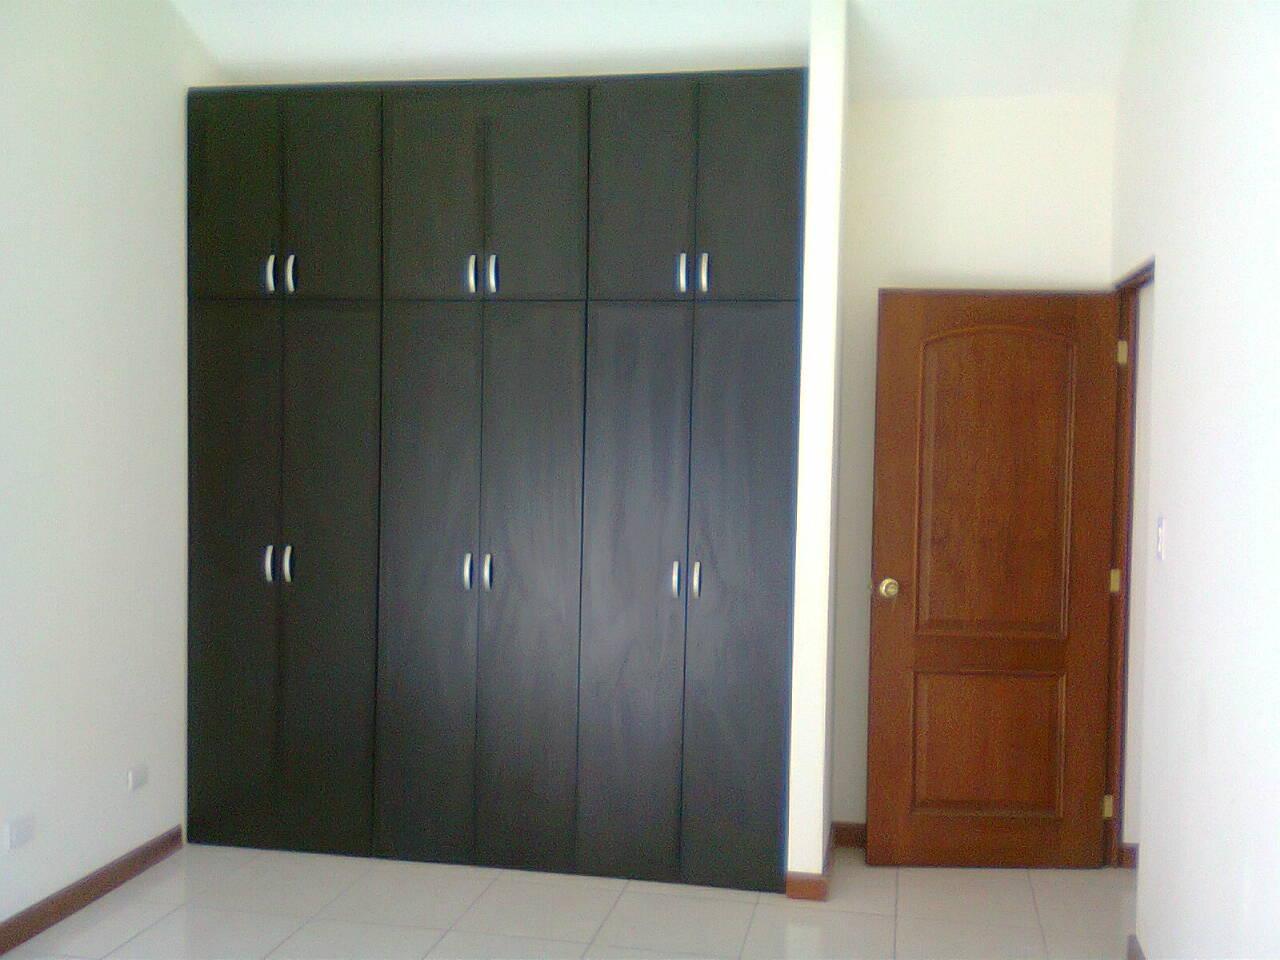 Closet en melamina color wengue cocinas funcionales for Closet melamina